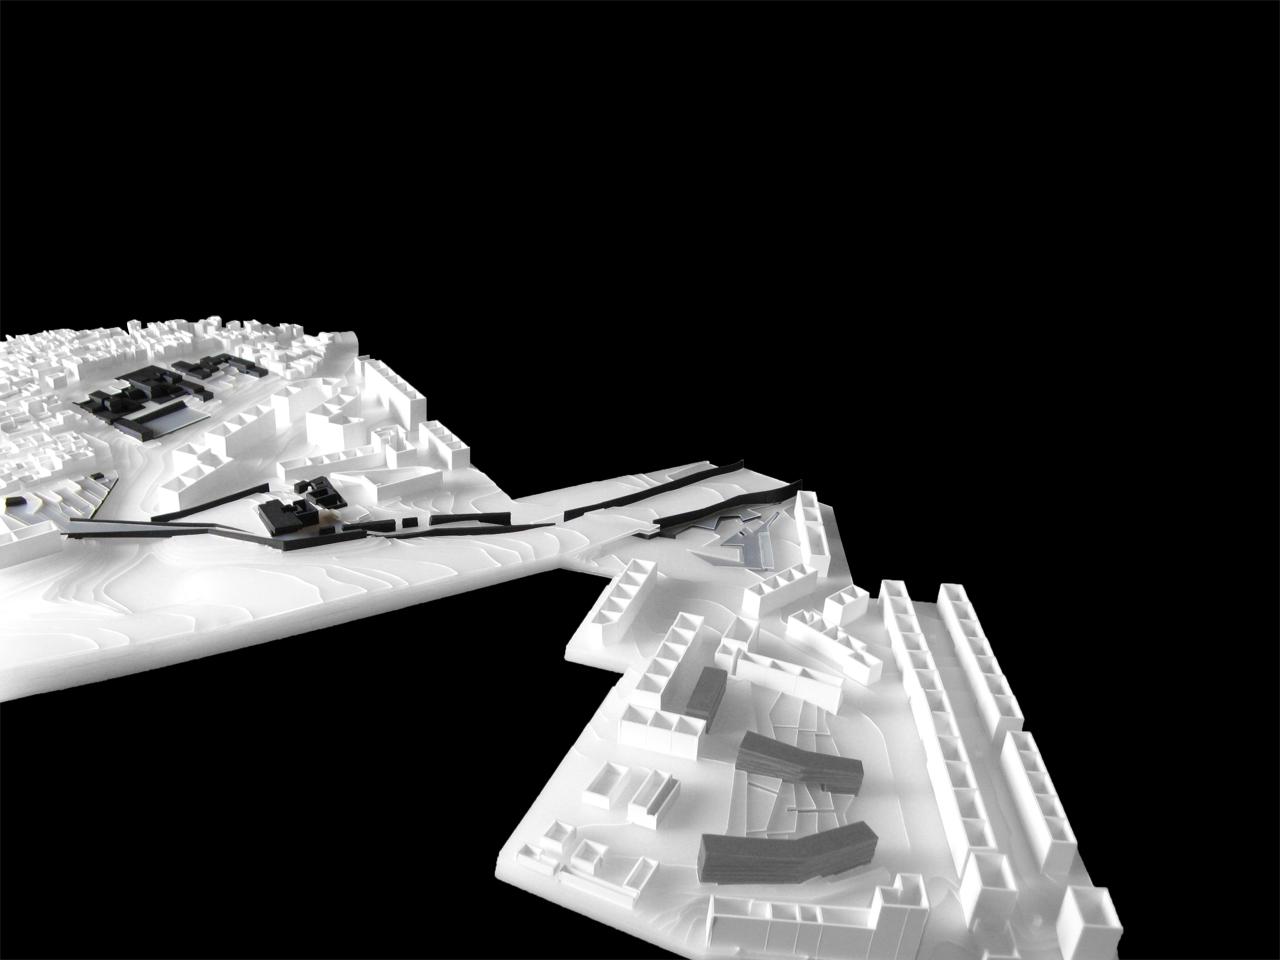 Prêmio Secil Universidades – Arquitetura: URBANDUTO | indutor de urbanidade na Cova da Moura / Luísa Lopes e Rafaela Naia, Maquete